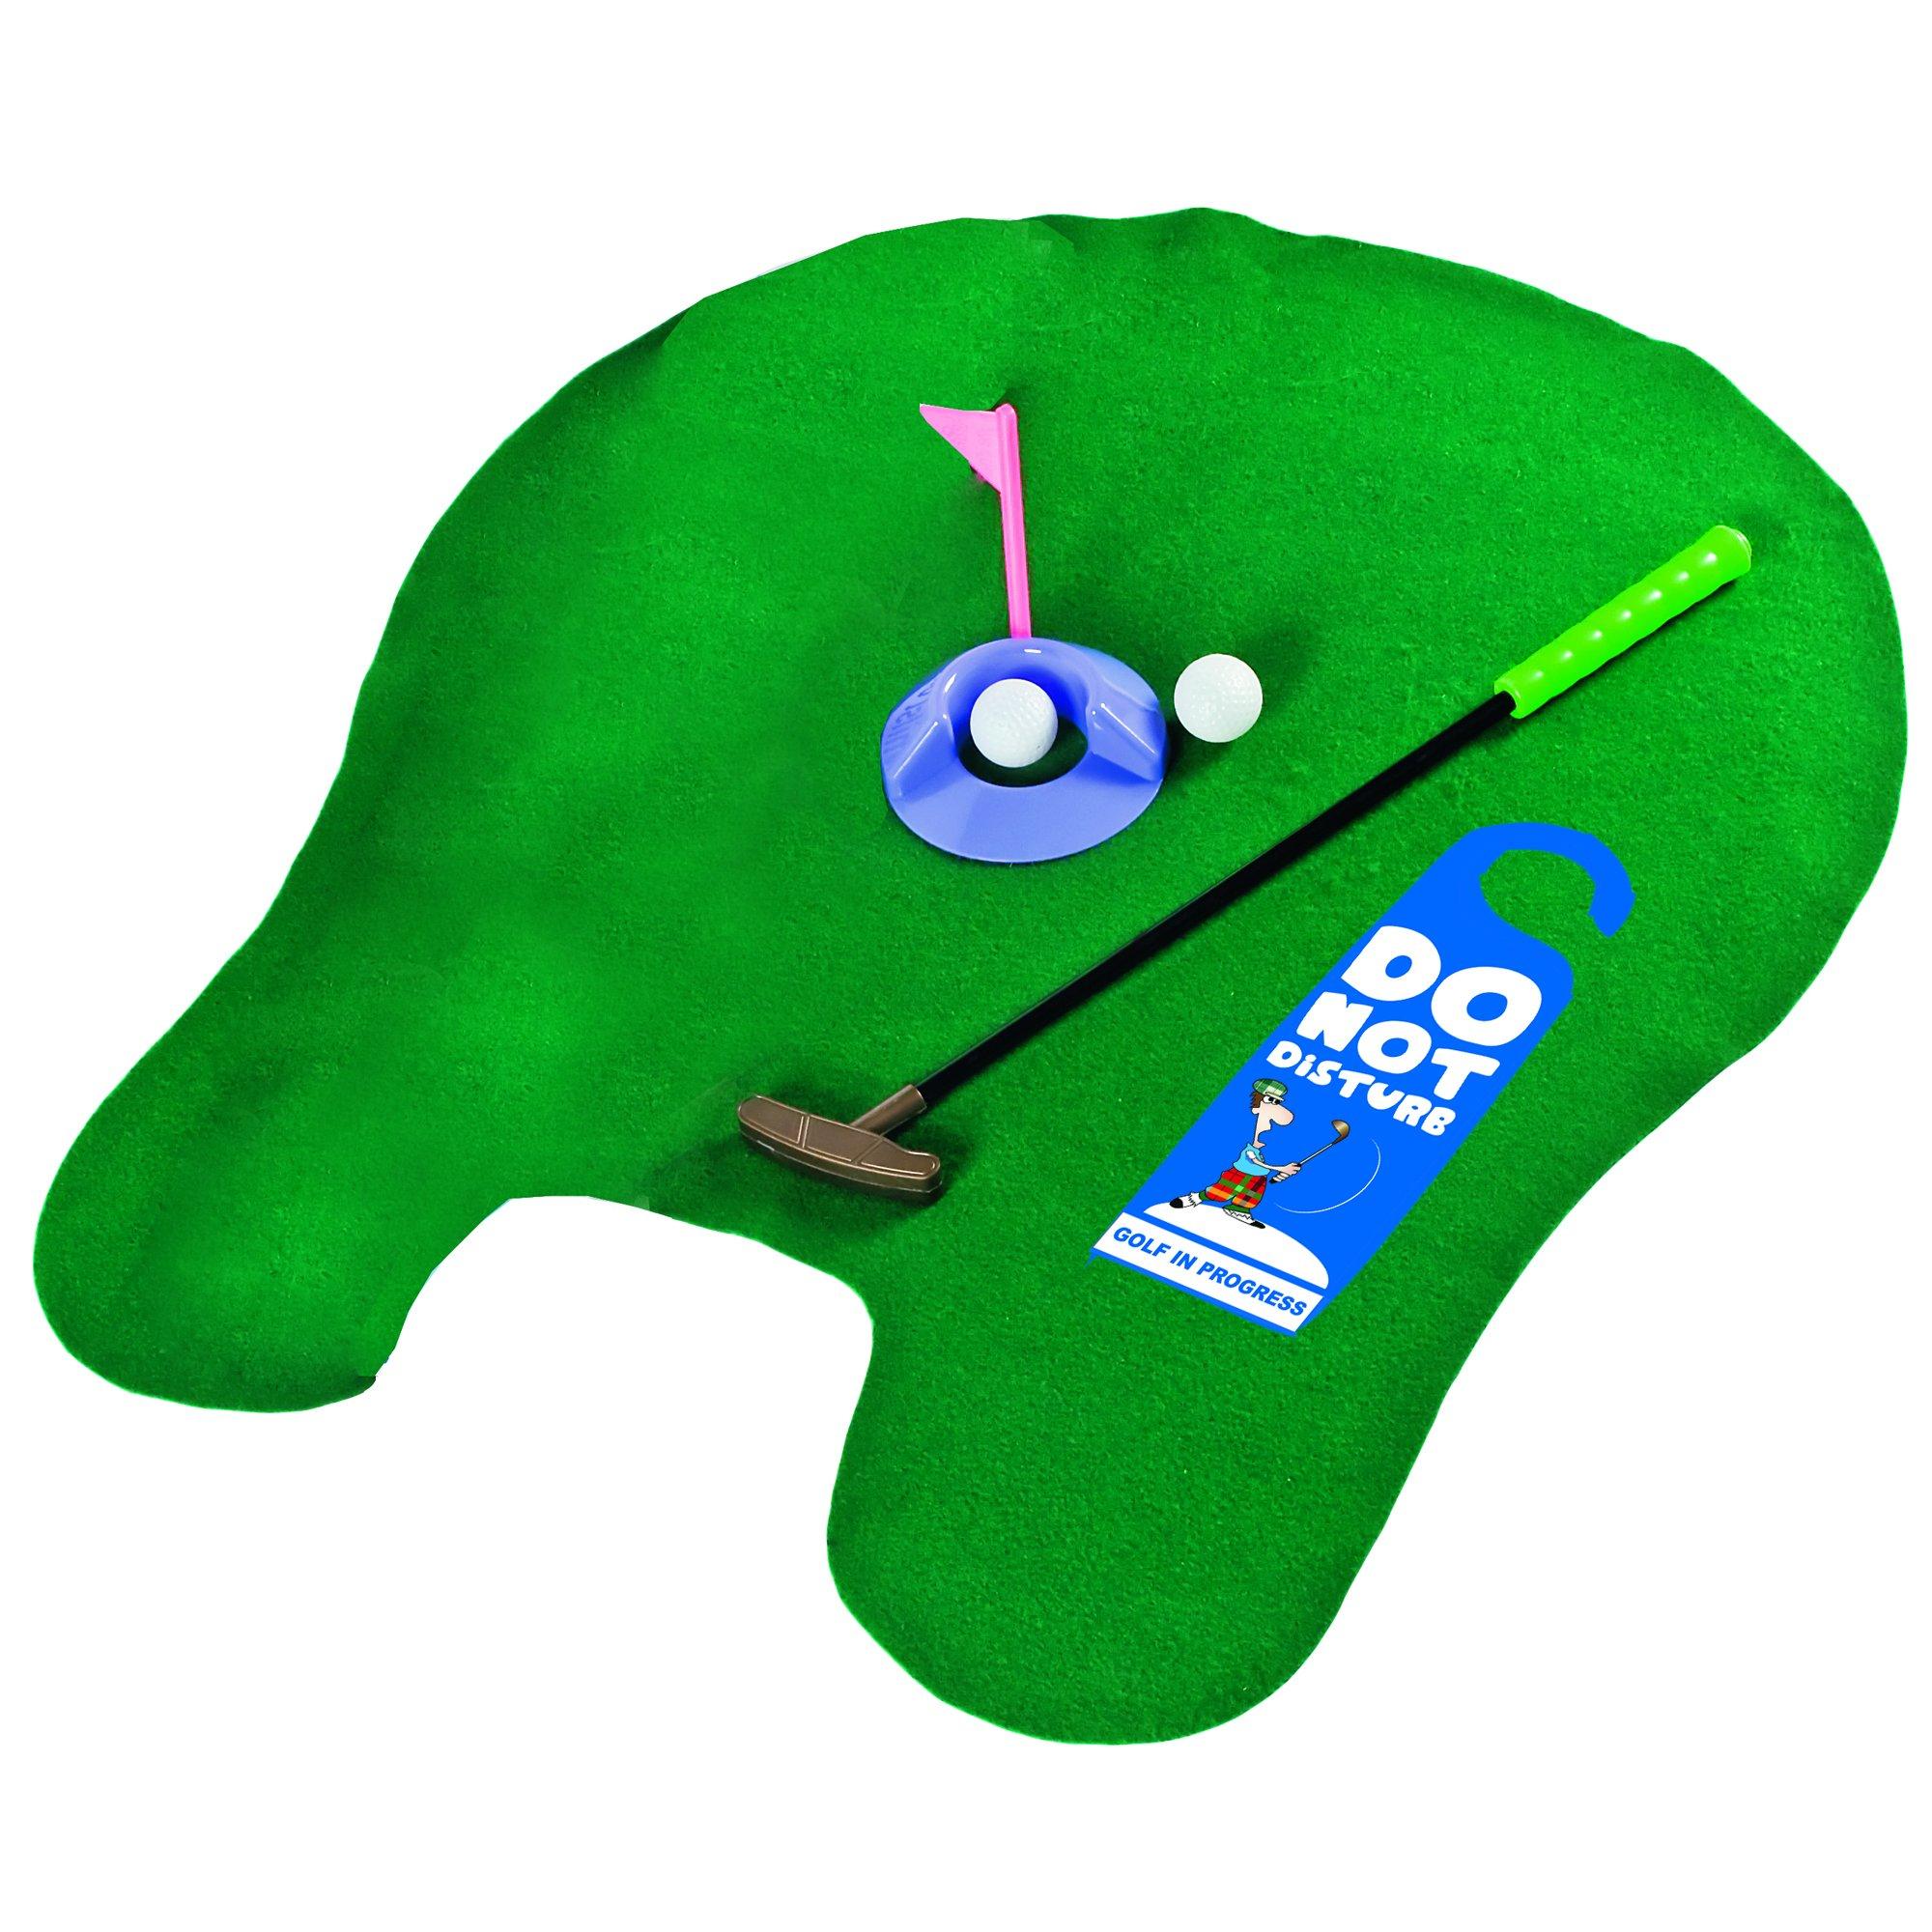 Longridge Potty Puttergolf Trainer Golf Set For Wc Green